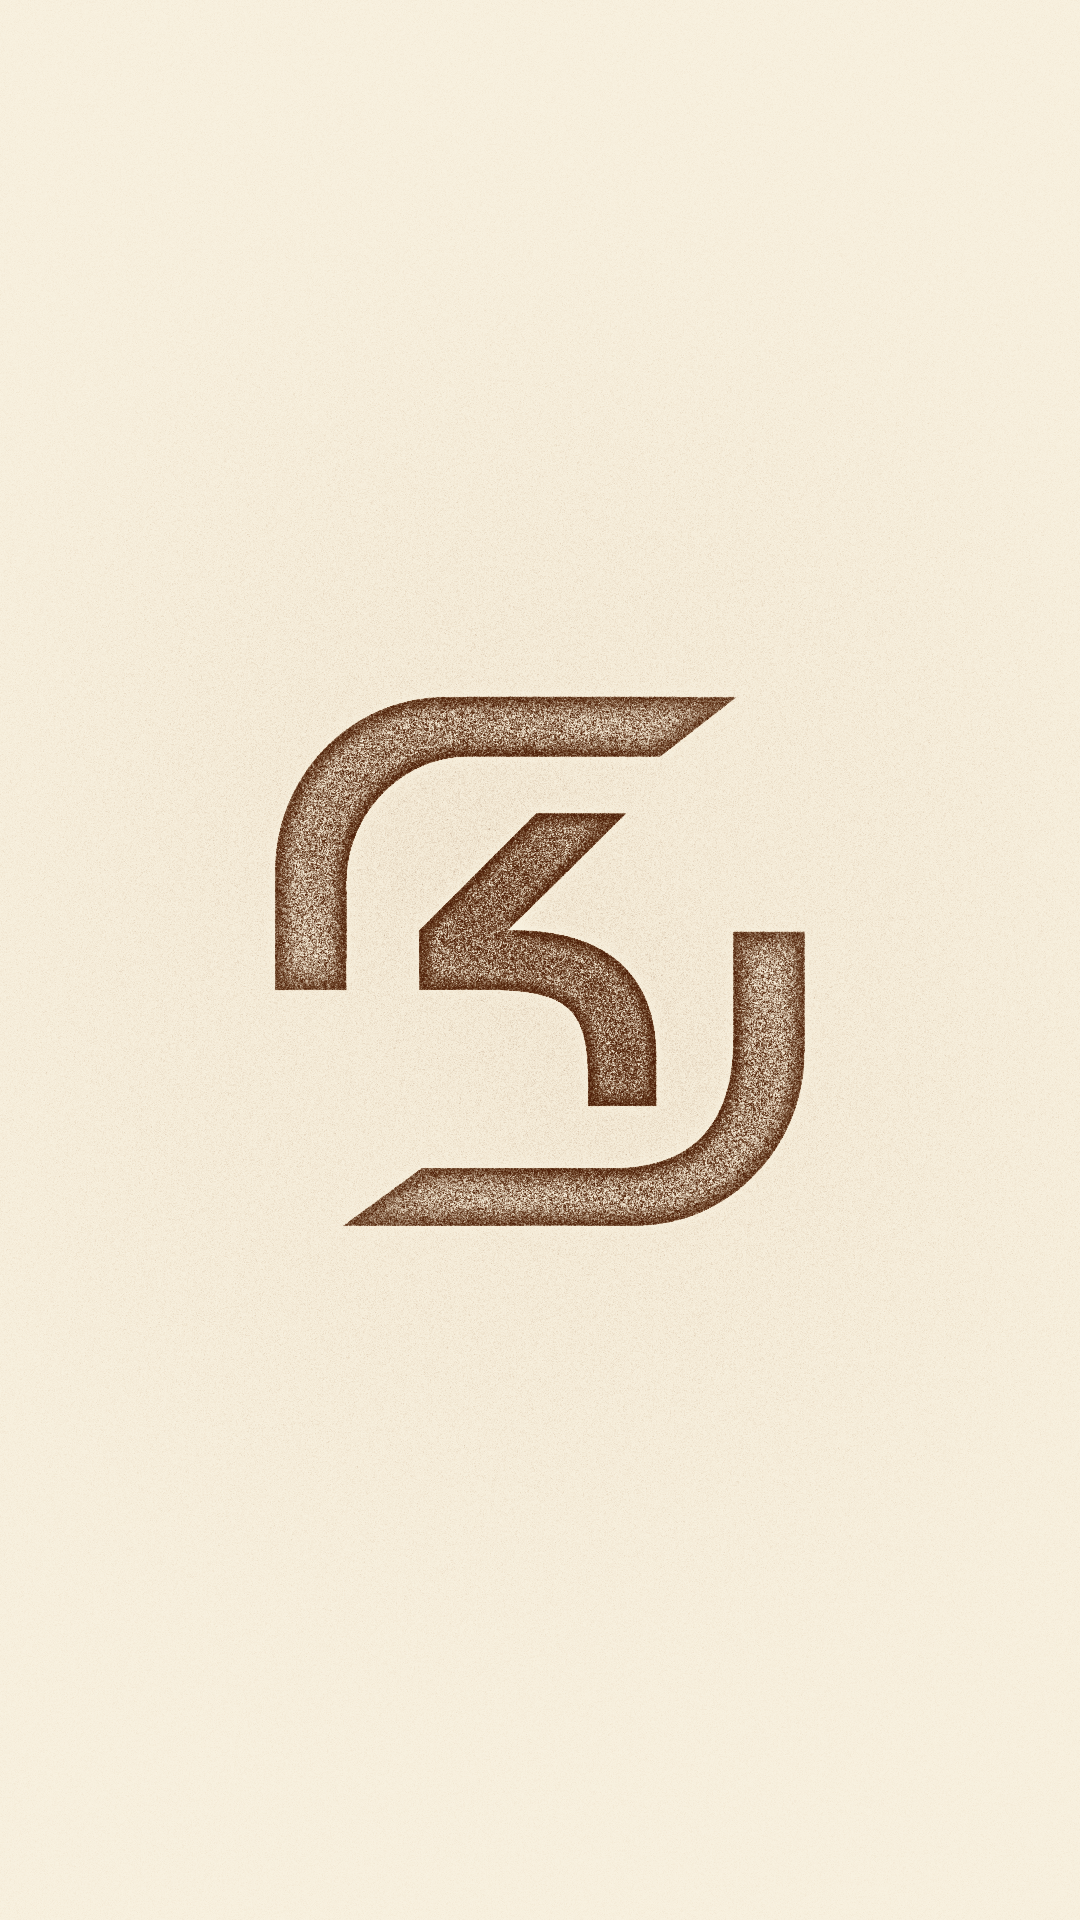 SK Gaming - Mobile